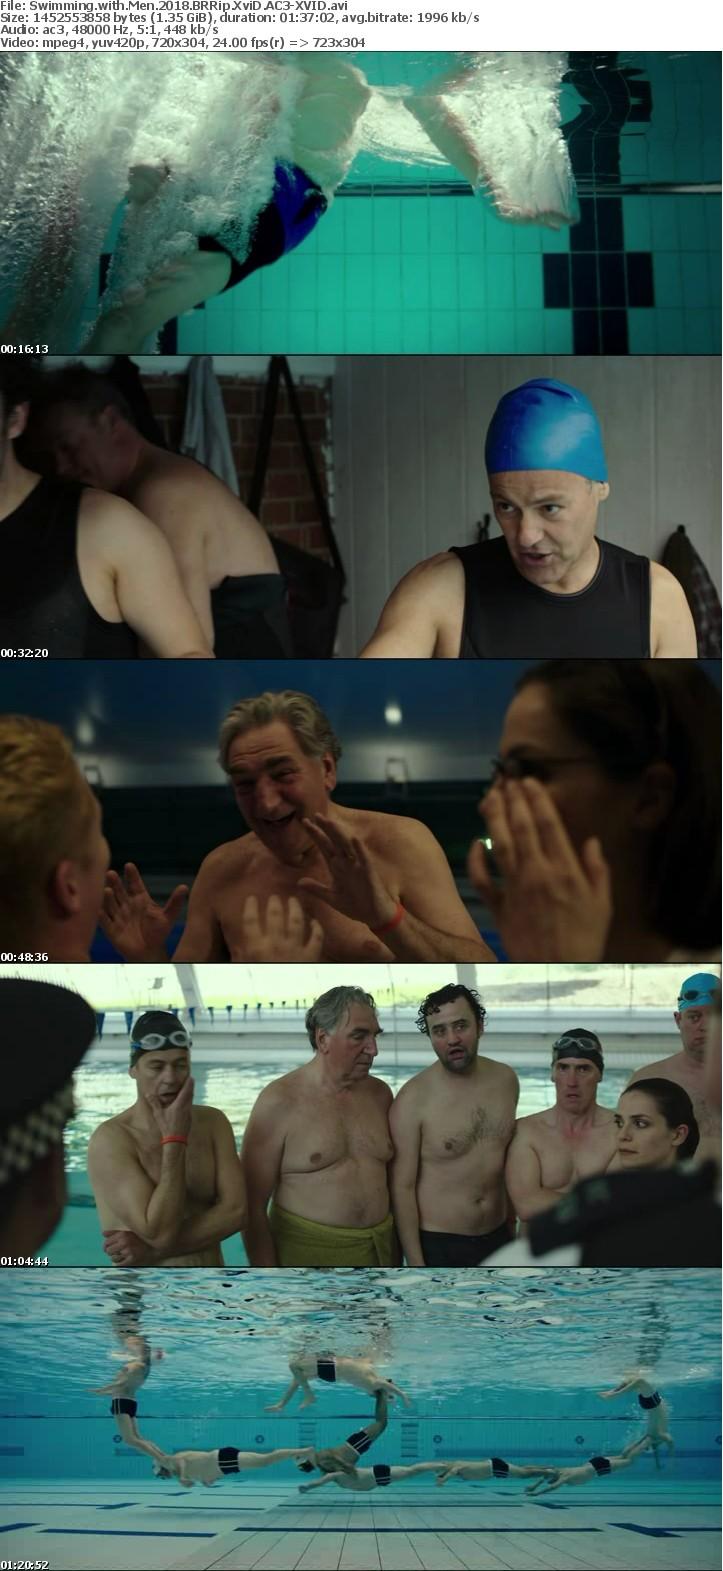 Swimming with Men 2018 BRRip XviD AC3-XVID